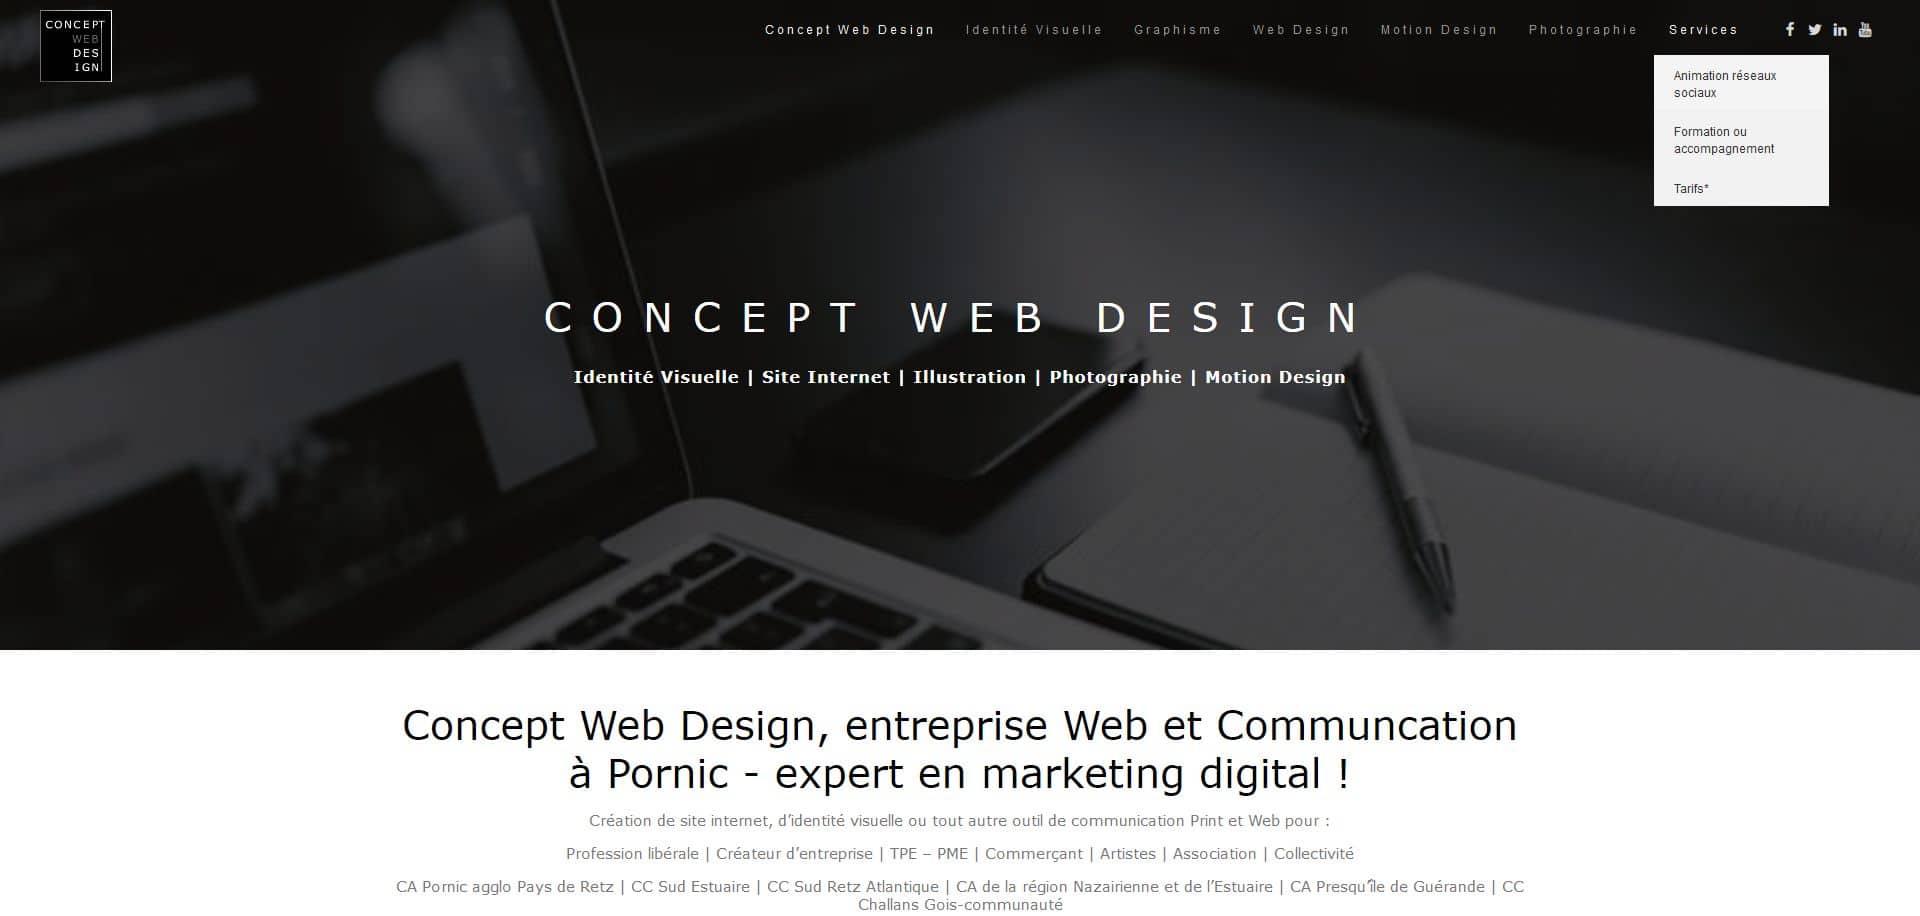 concept-web-design-accueil